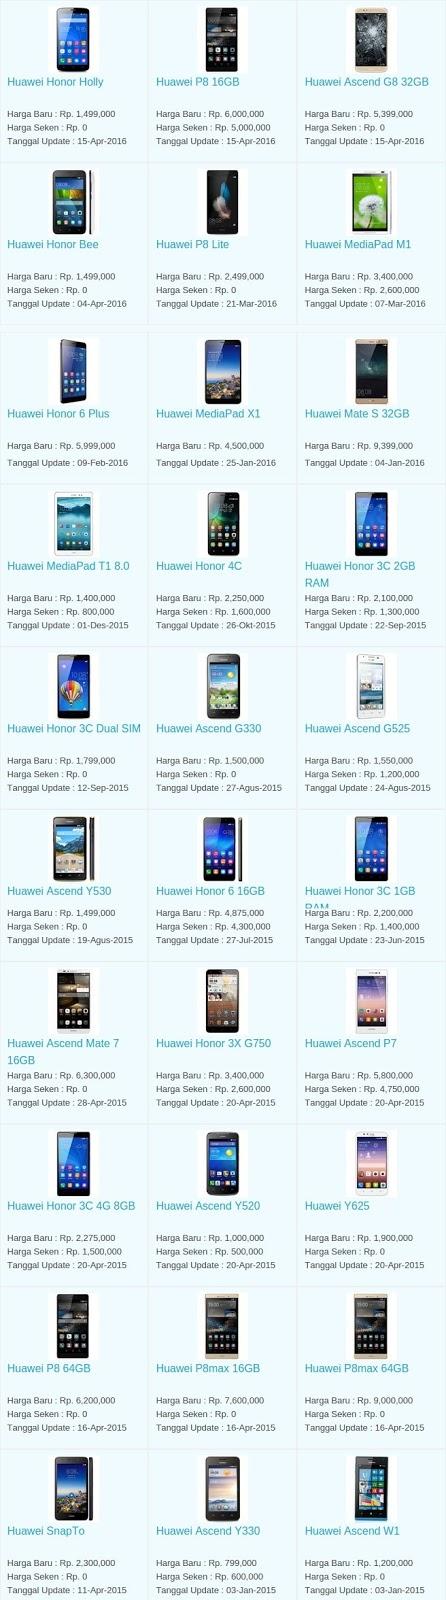 Daftar Harga Hp Terbaru Huawei Mei 2016